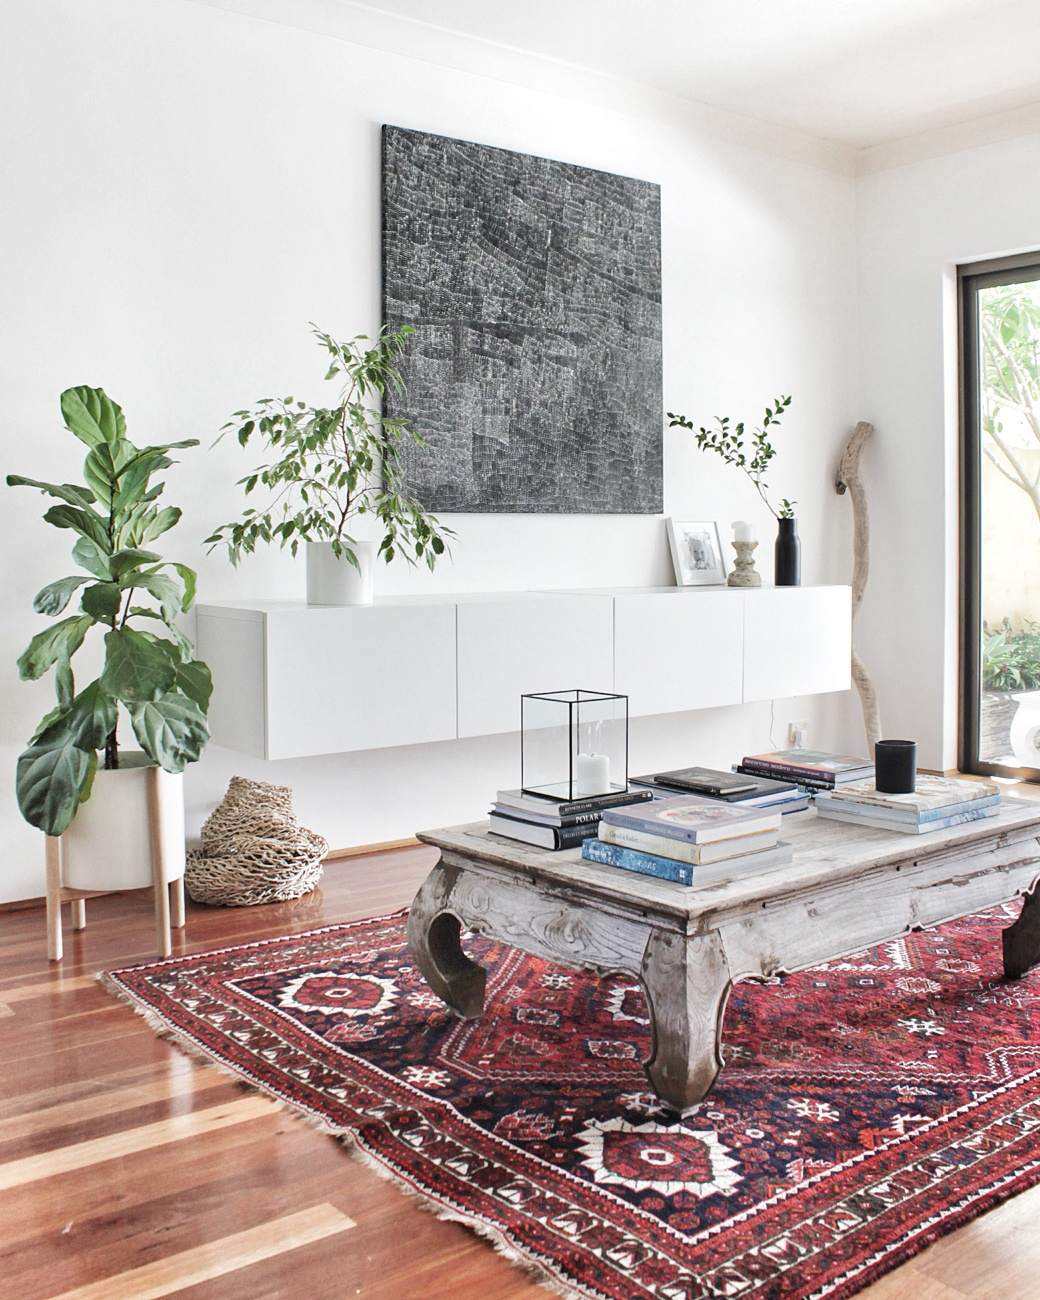 California Eclectic on the Australian Coast, Meet Stylist Mandy Hart